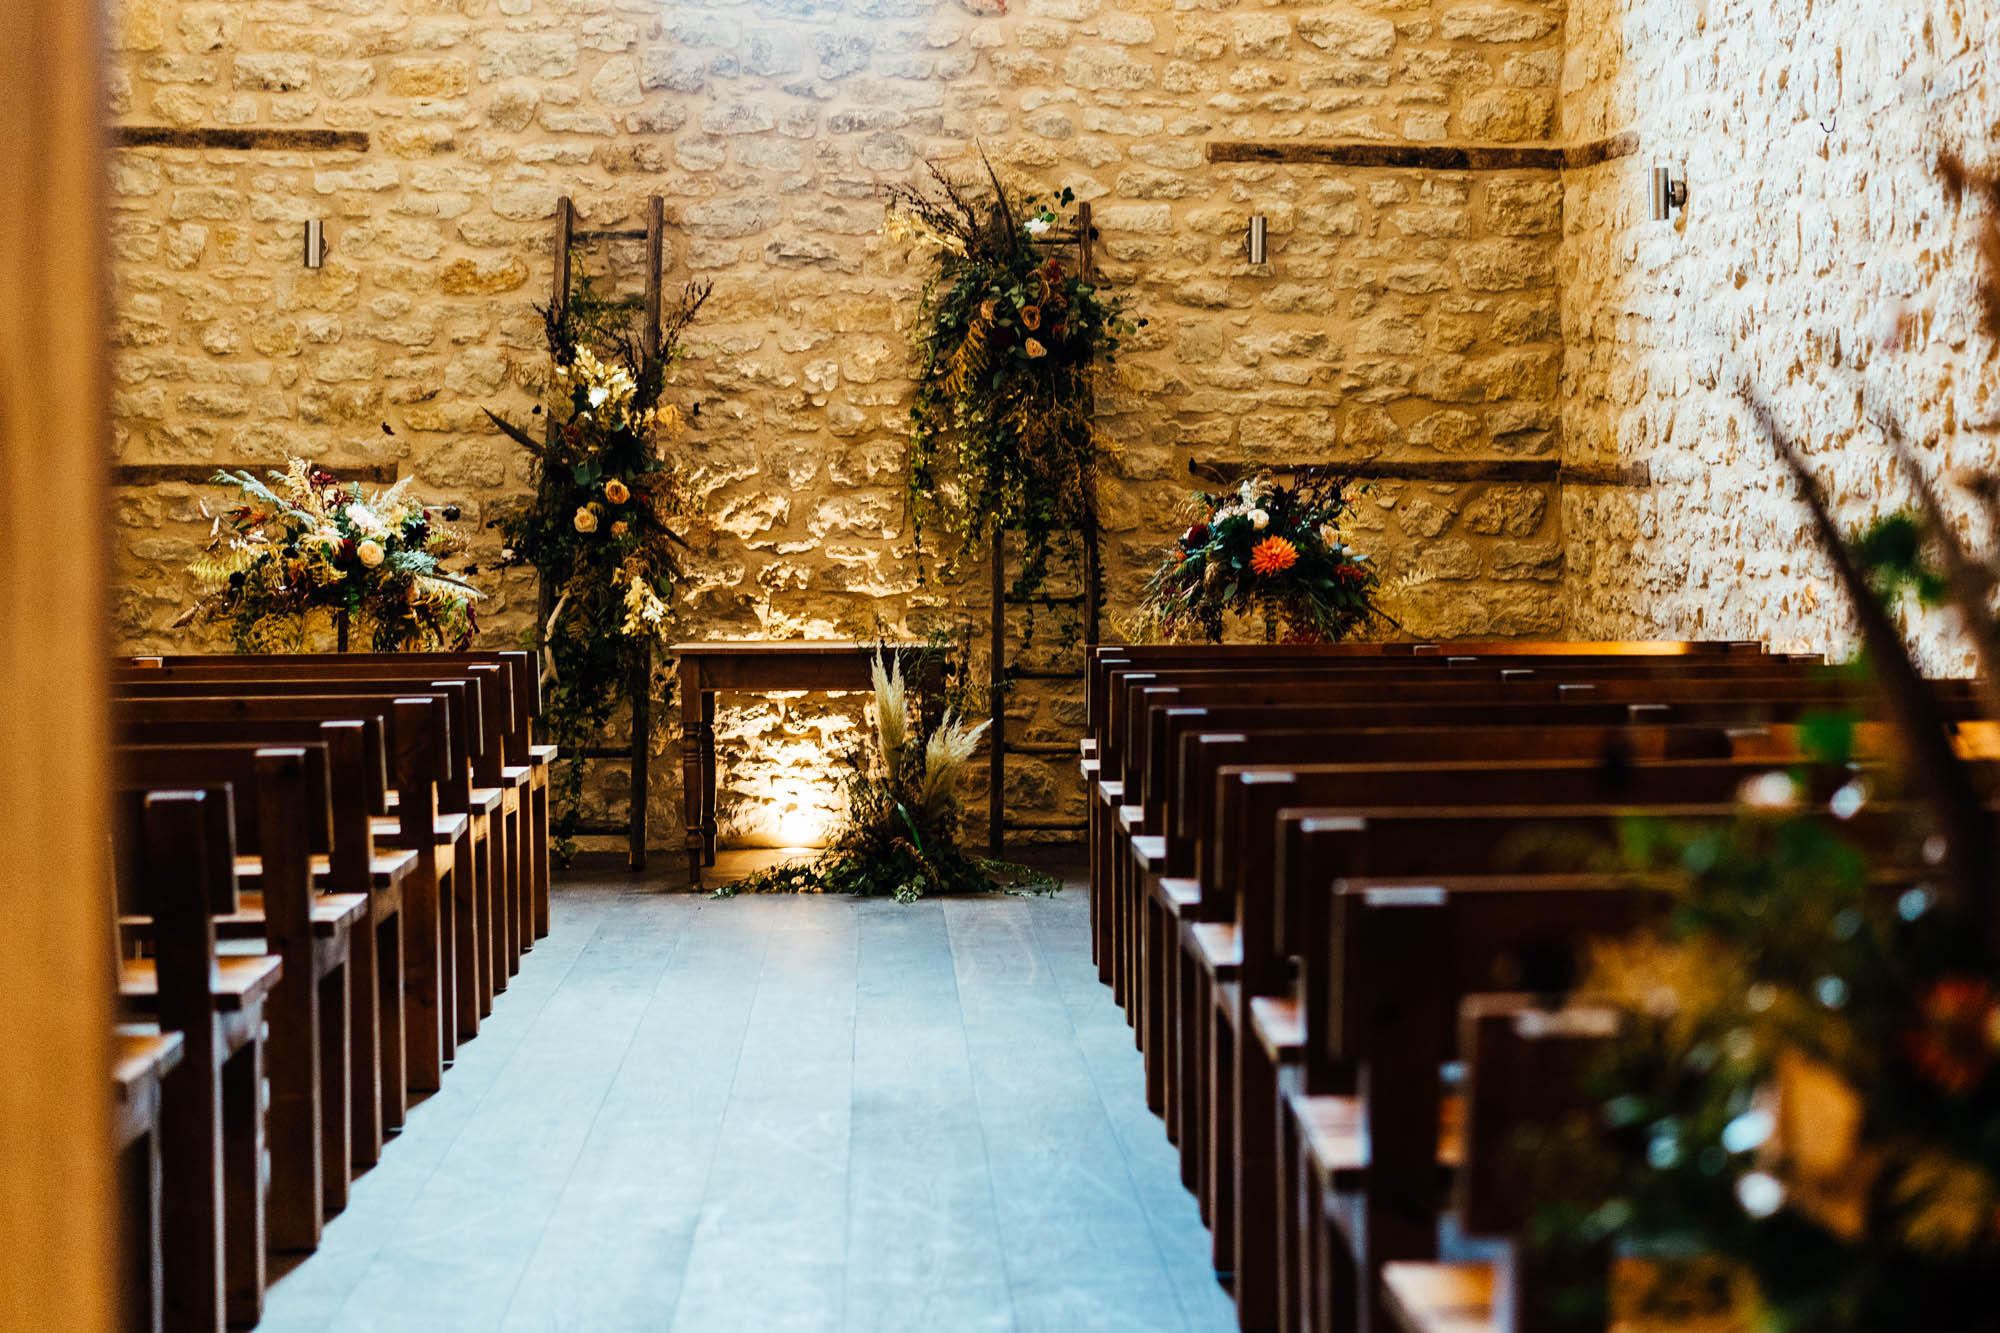 huntsmill-farm-wedding-inspiration-12